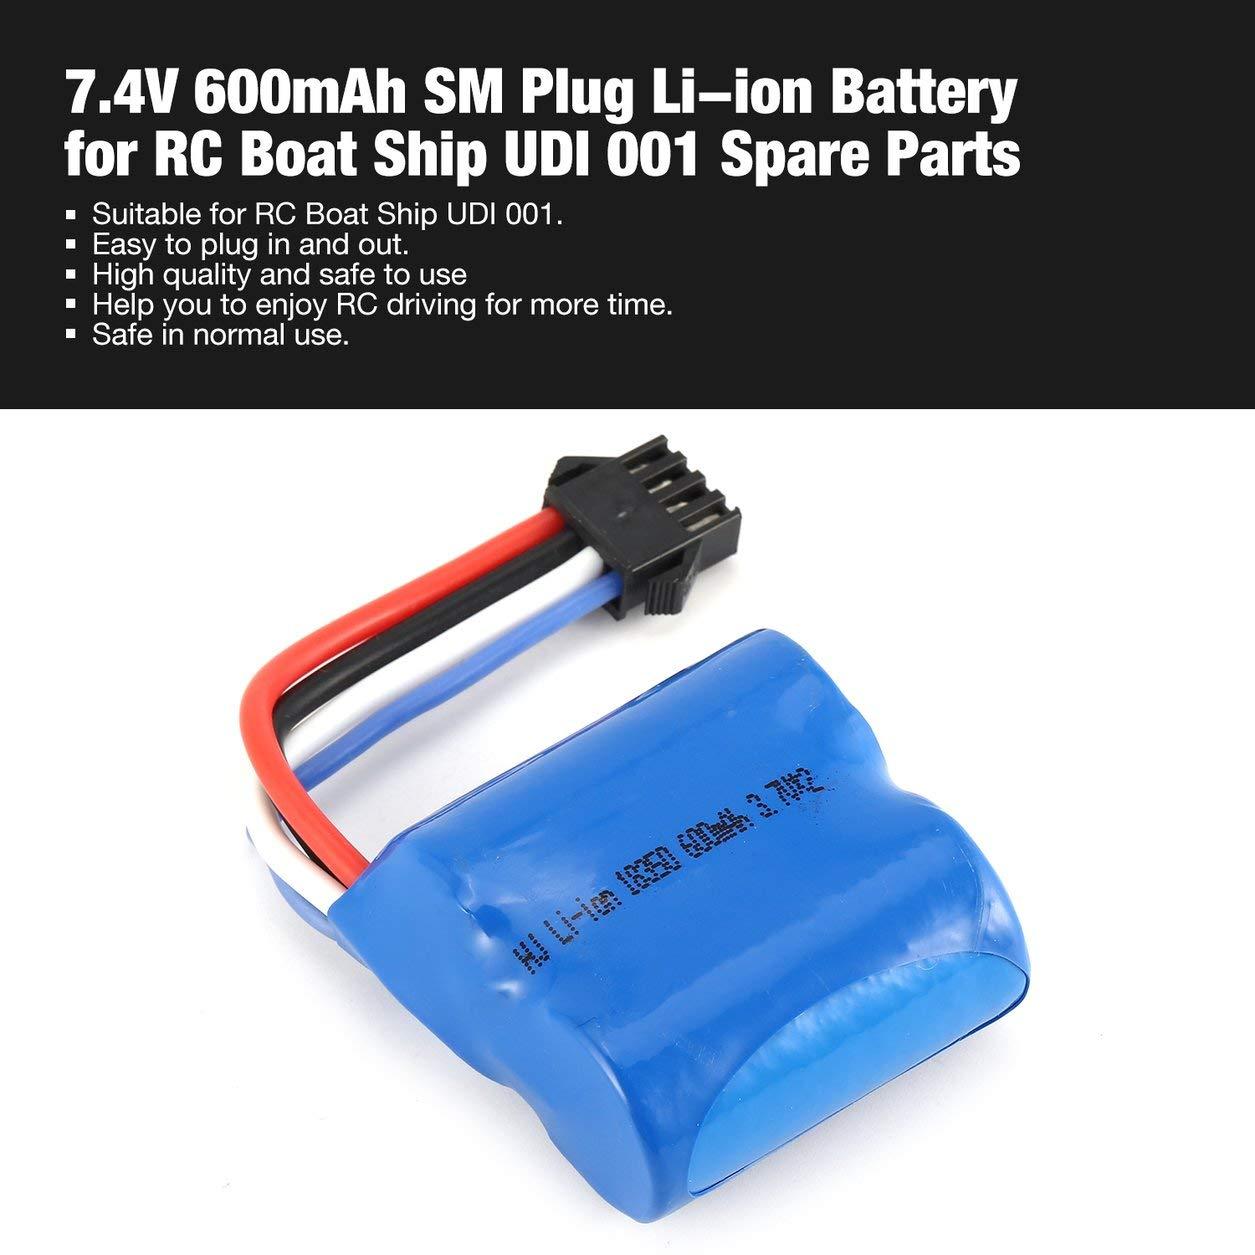 Dailyinshop 7.4V 600mAh SM Plug Li-ion Battery for RC Boat Ship UDI 001 Spare Parts( Color:Blue)